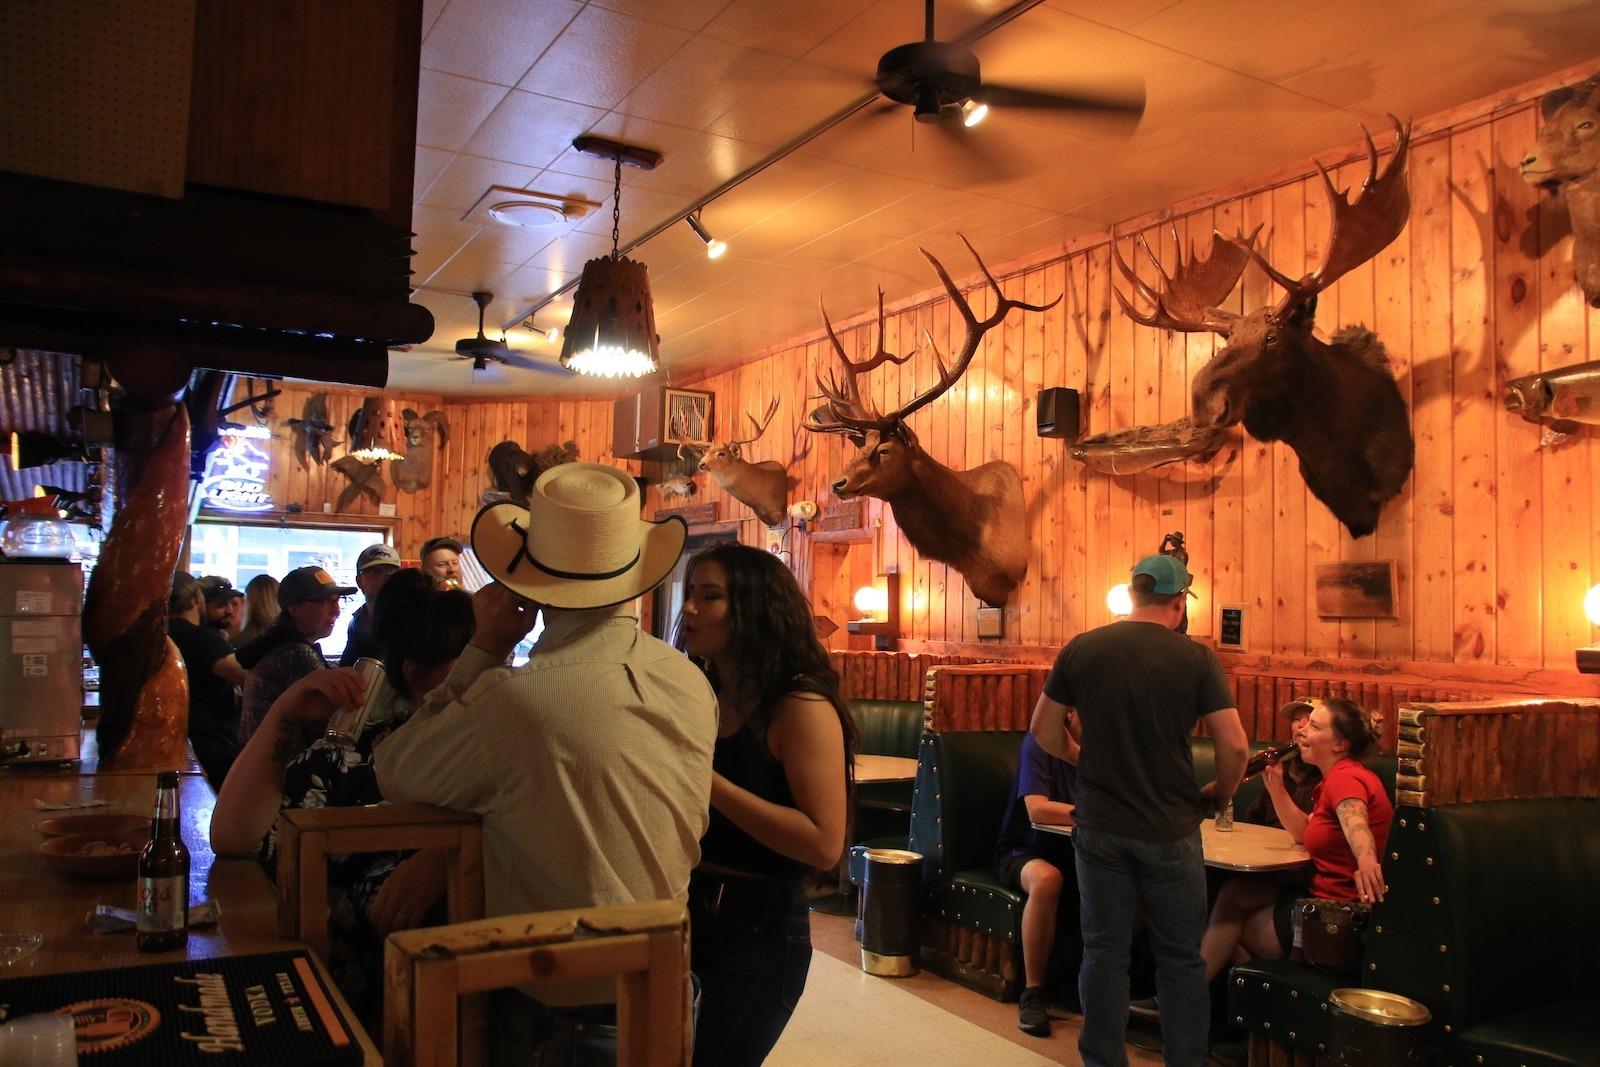 Rustic Pine Tavern in Dubois